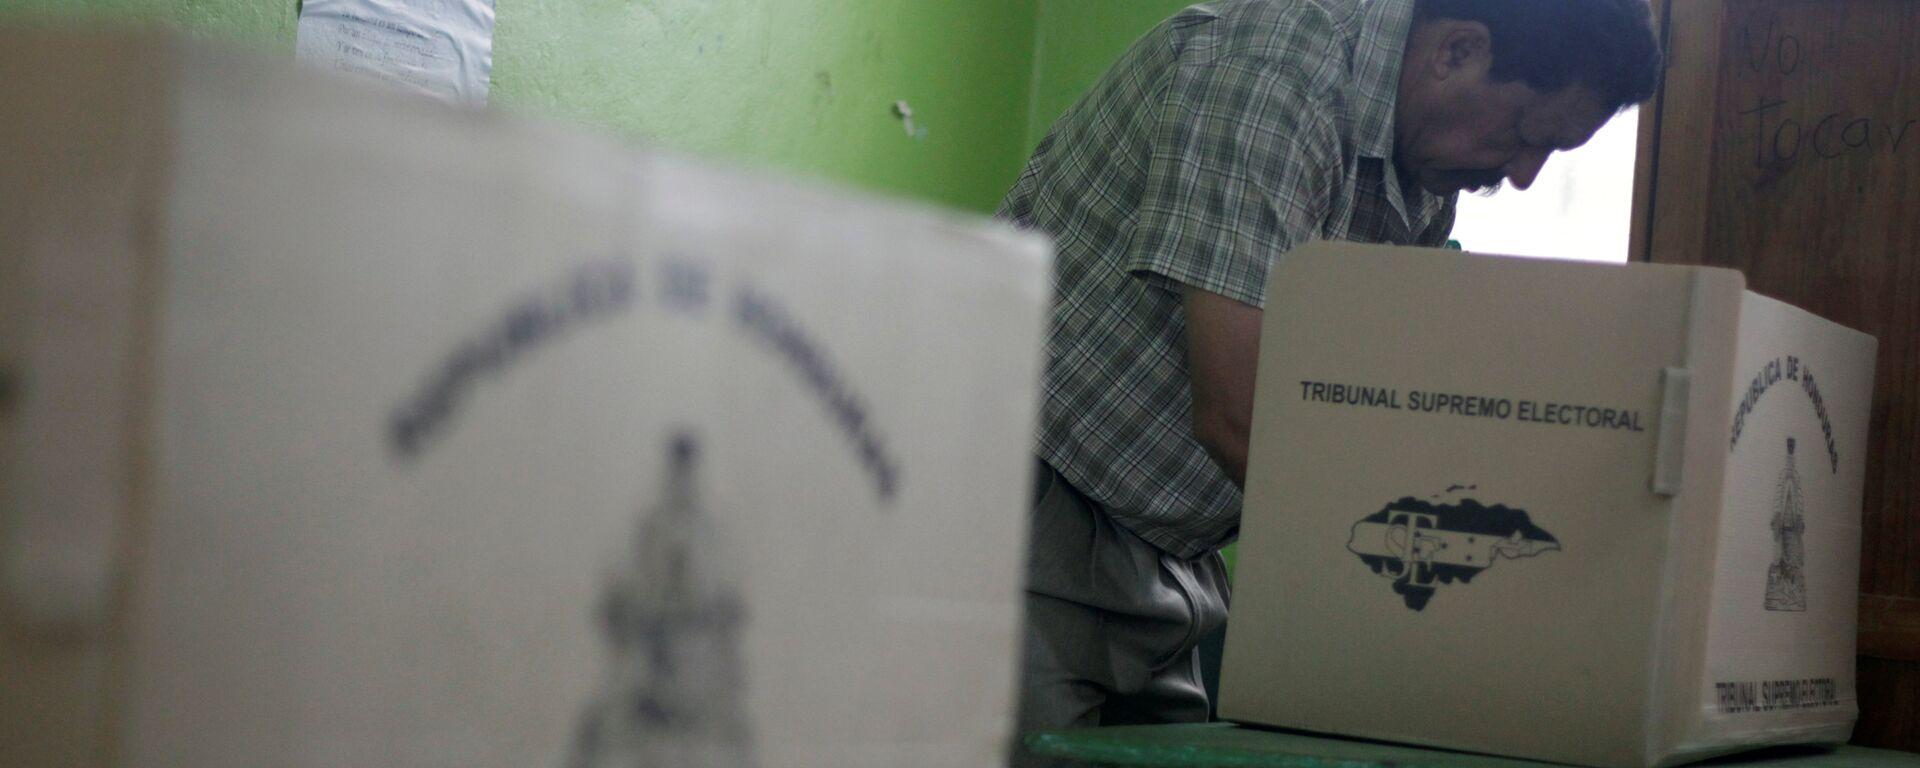 Elecciones en Honduras  - Sputnik Mundo, 1920, 12.03.2021